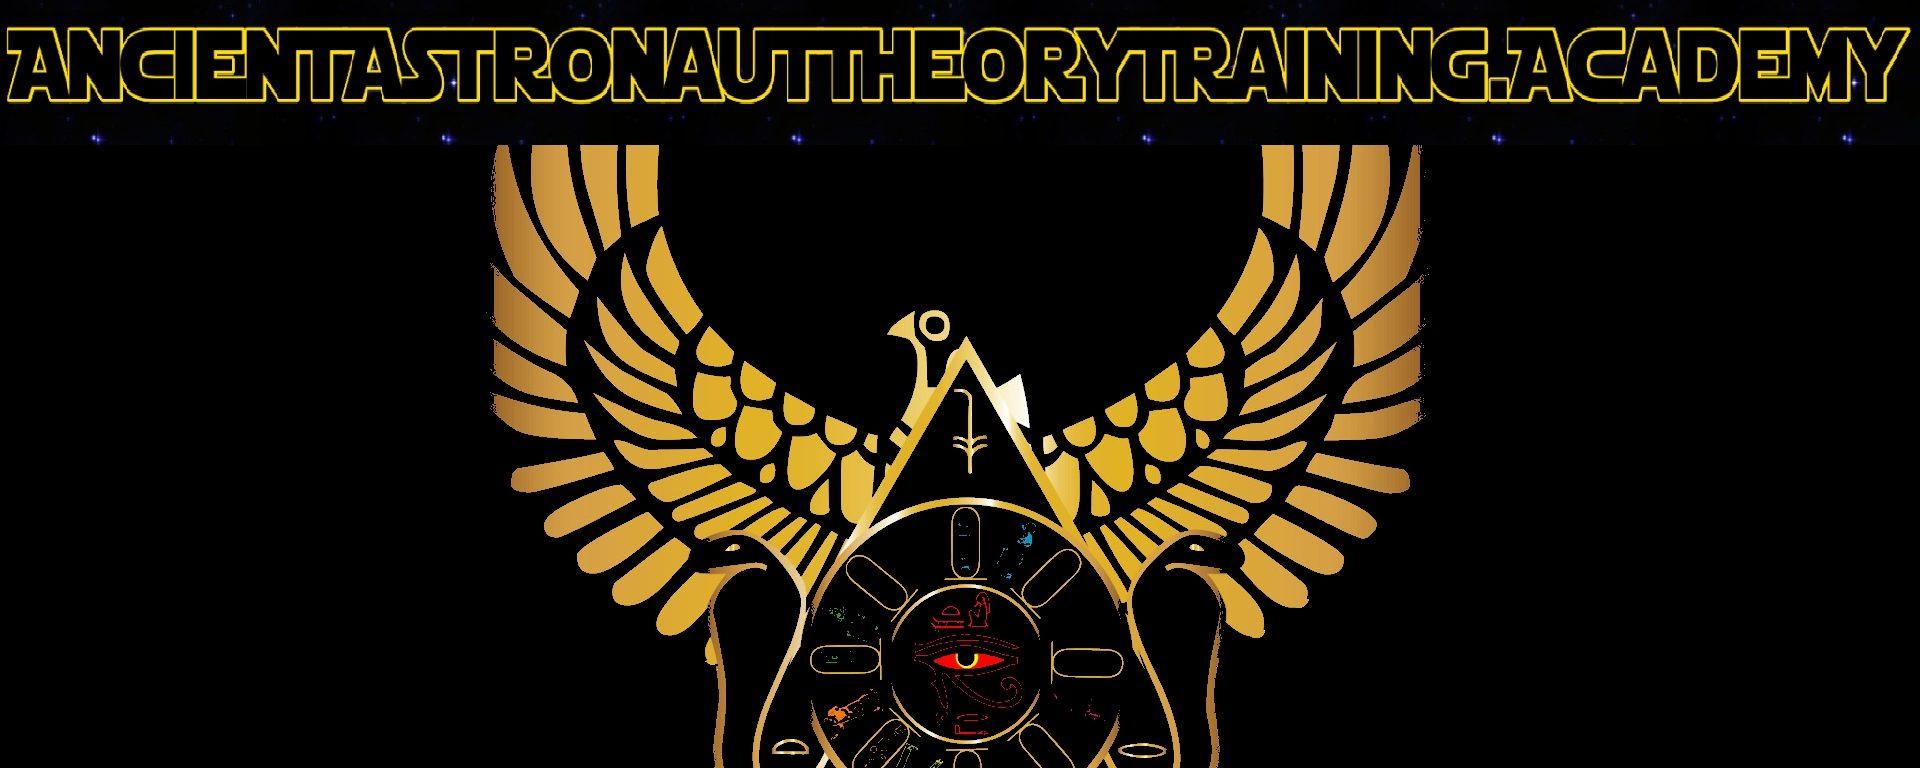 Ancient Astronaut Theory Training Academy